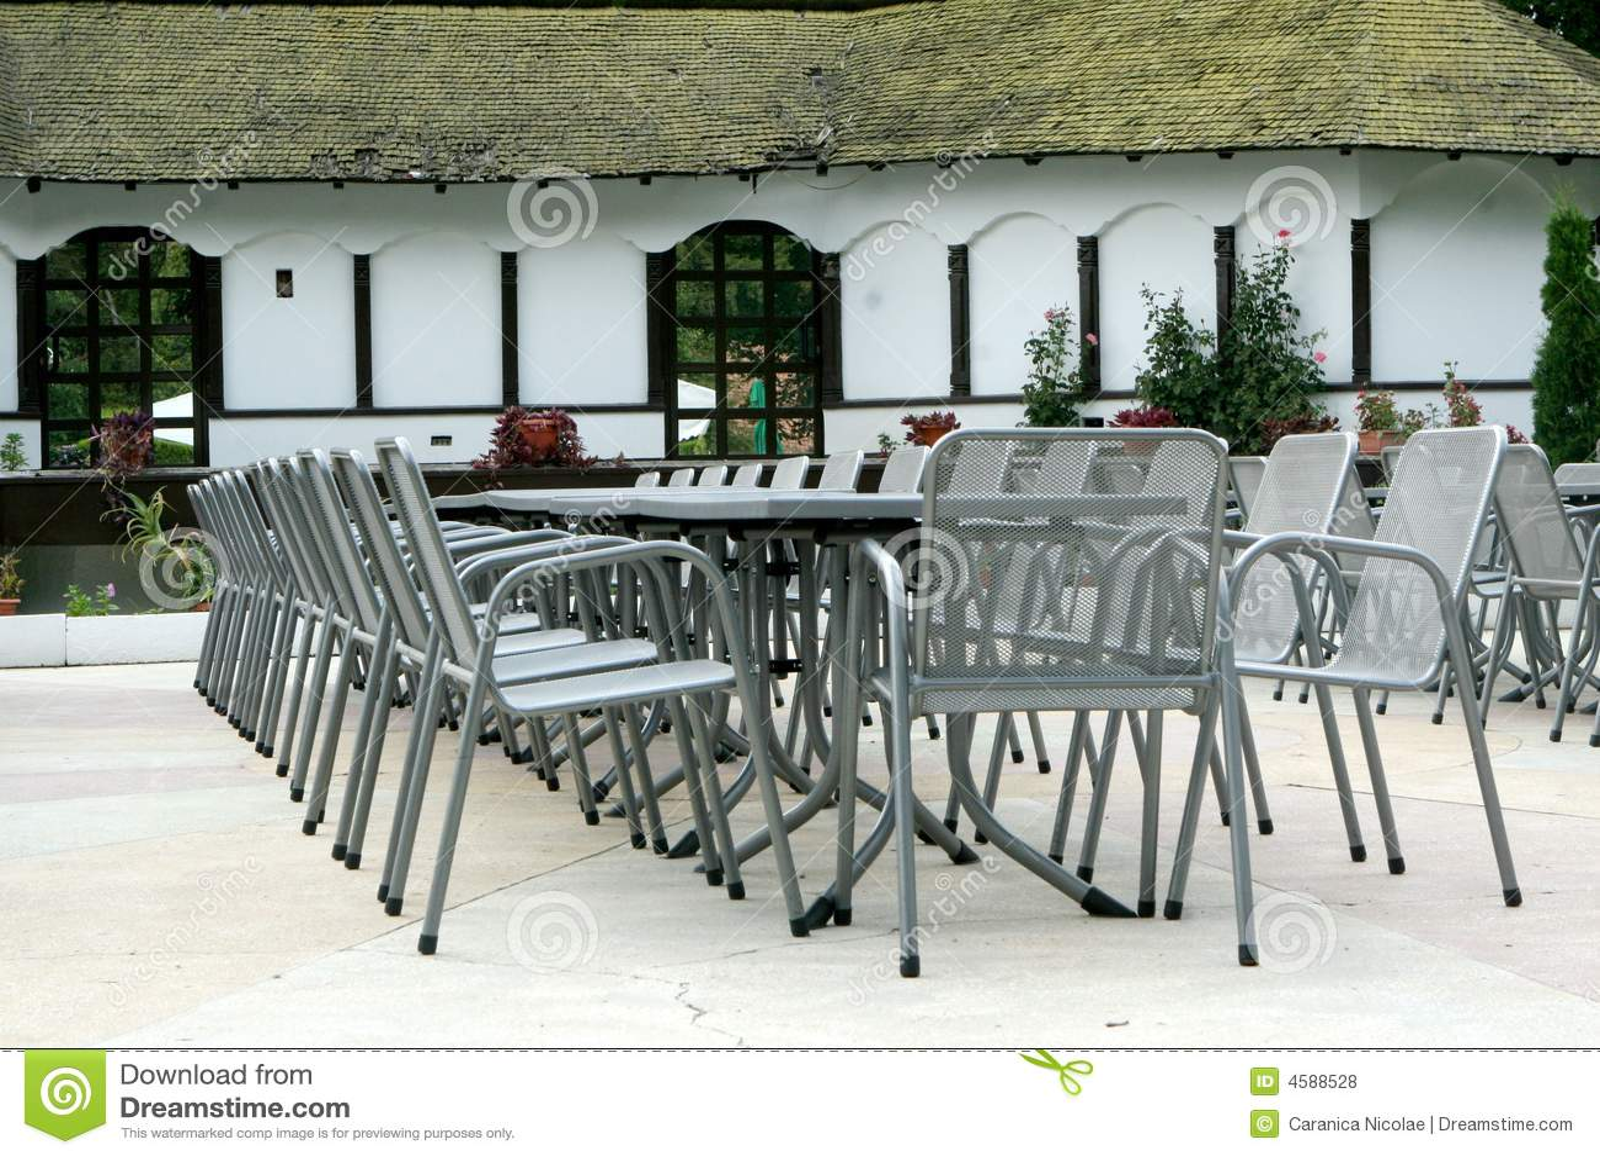 Outdoor Chairs And Tables outdoor chairs and tables royalty free stock photos - image: 4588528